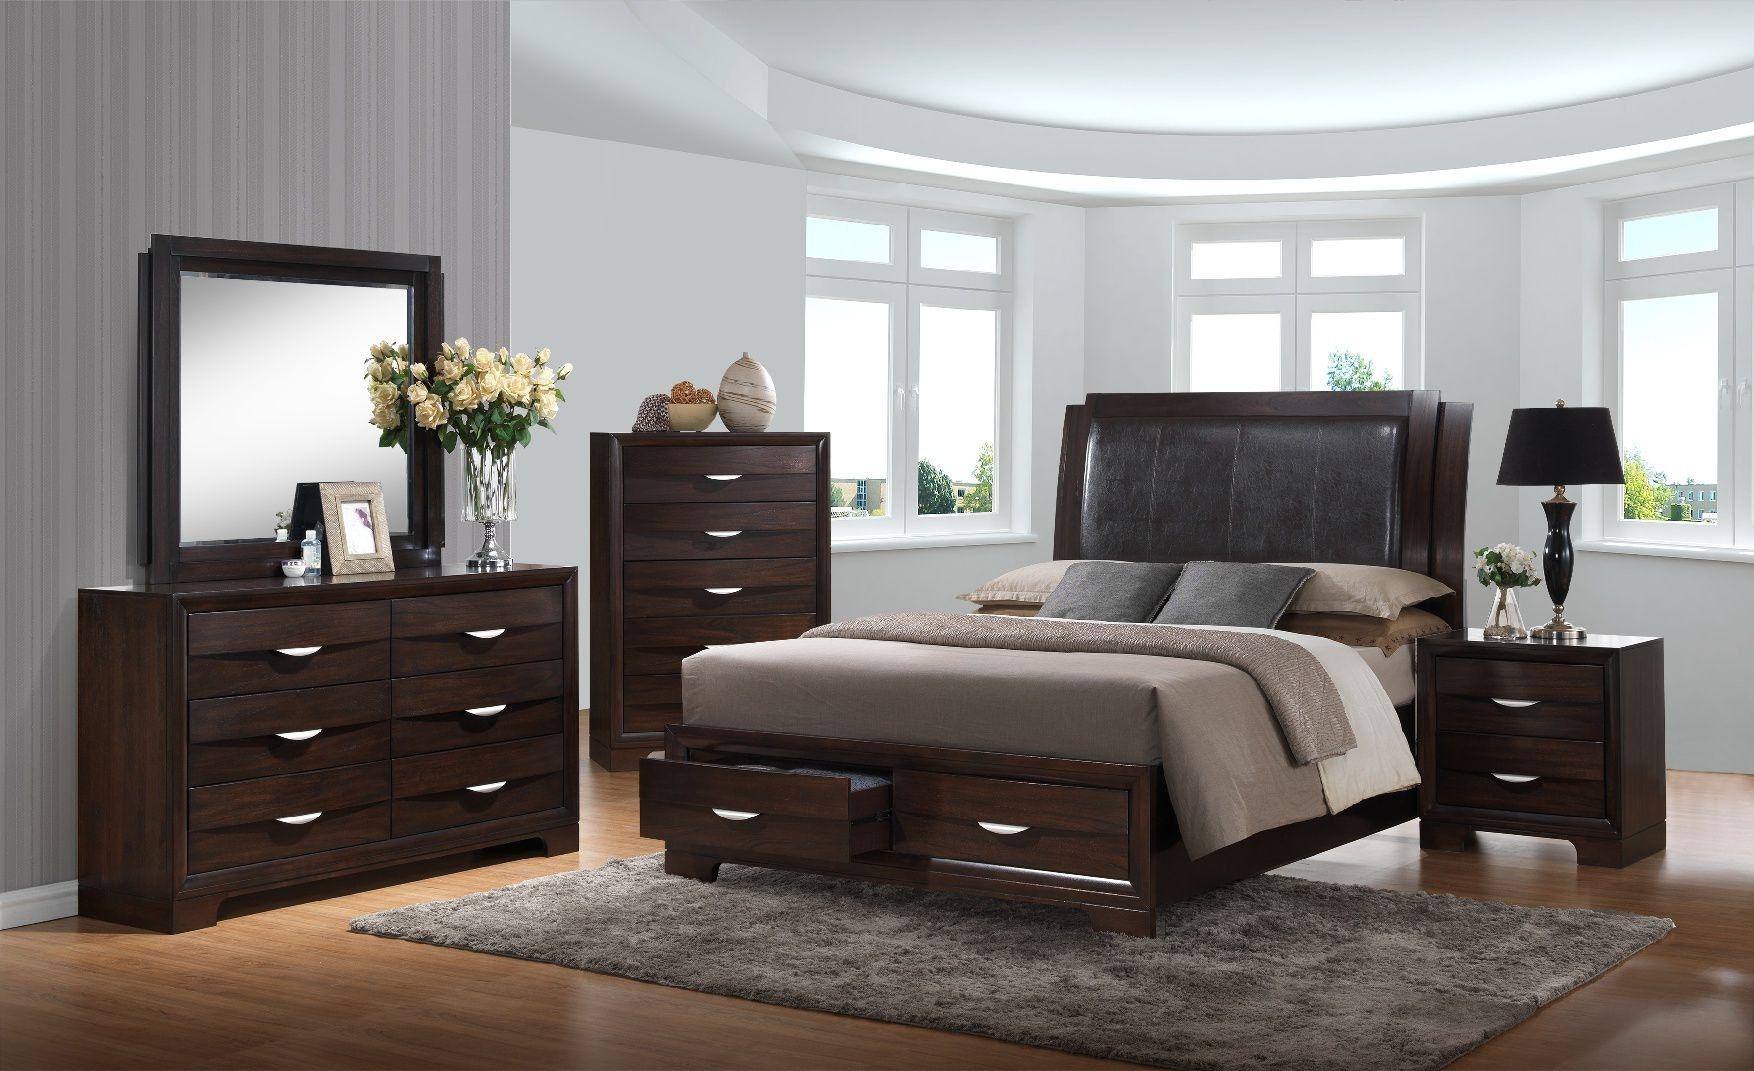 Elements International Brandy Dark Storage Bedroom